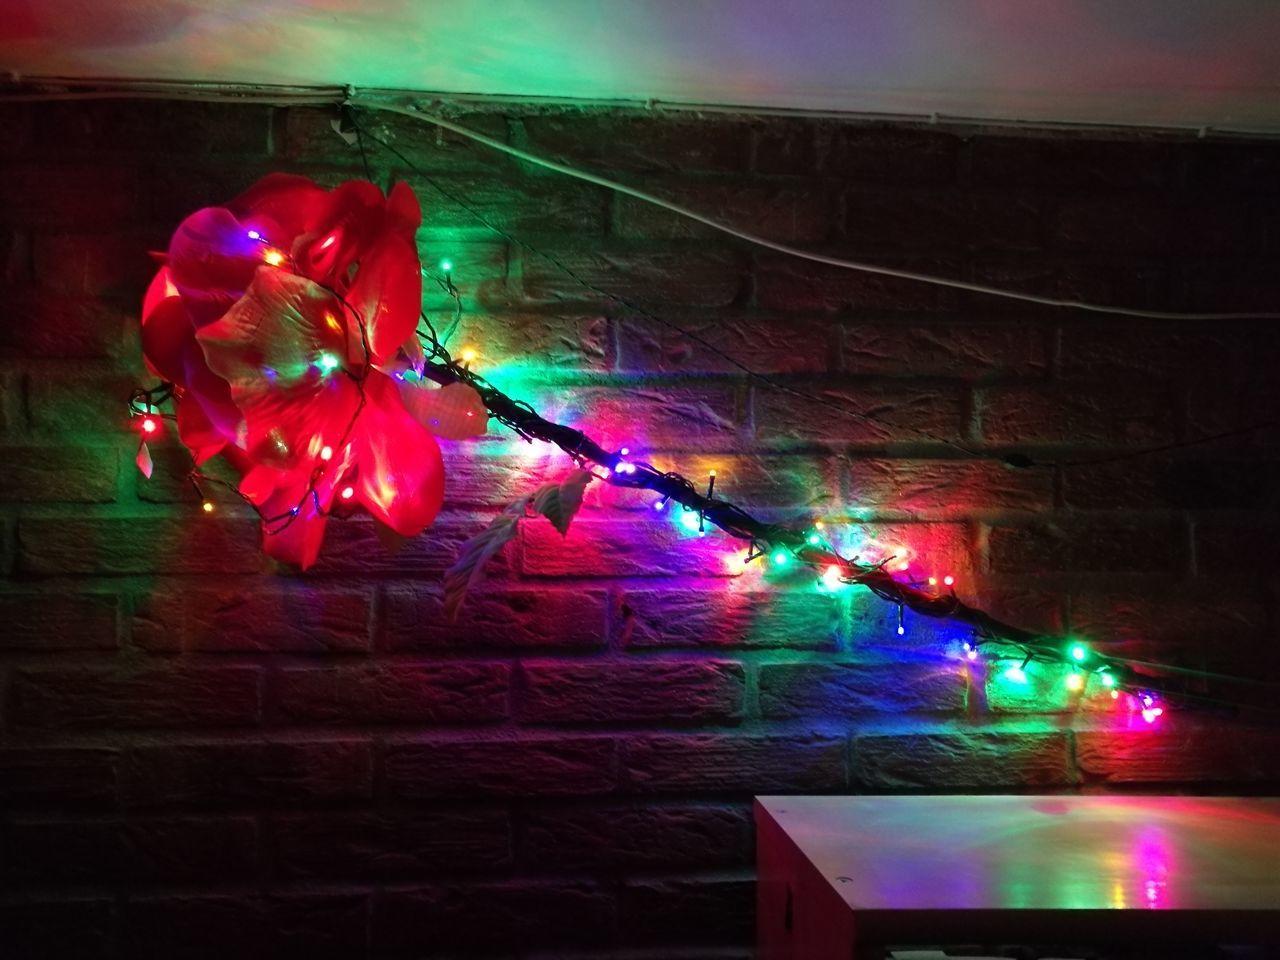 multi colored, illuminated, decoration, lighting equipment, celebration, indoors, night, christmas decoration, christmas ornament, party - social event, red, pink color, no people, christmas lights, balloon, disco lights, nightclub, architecture, close-up